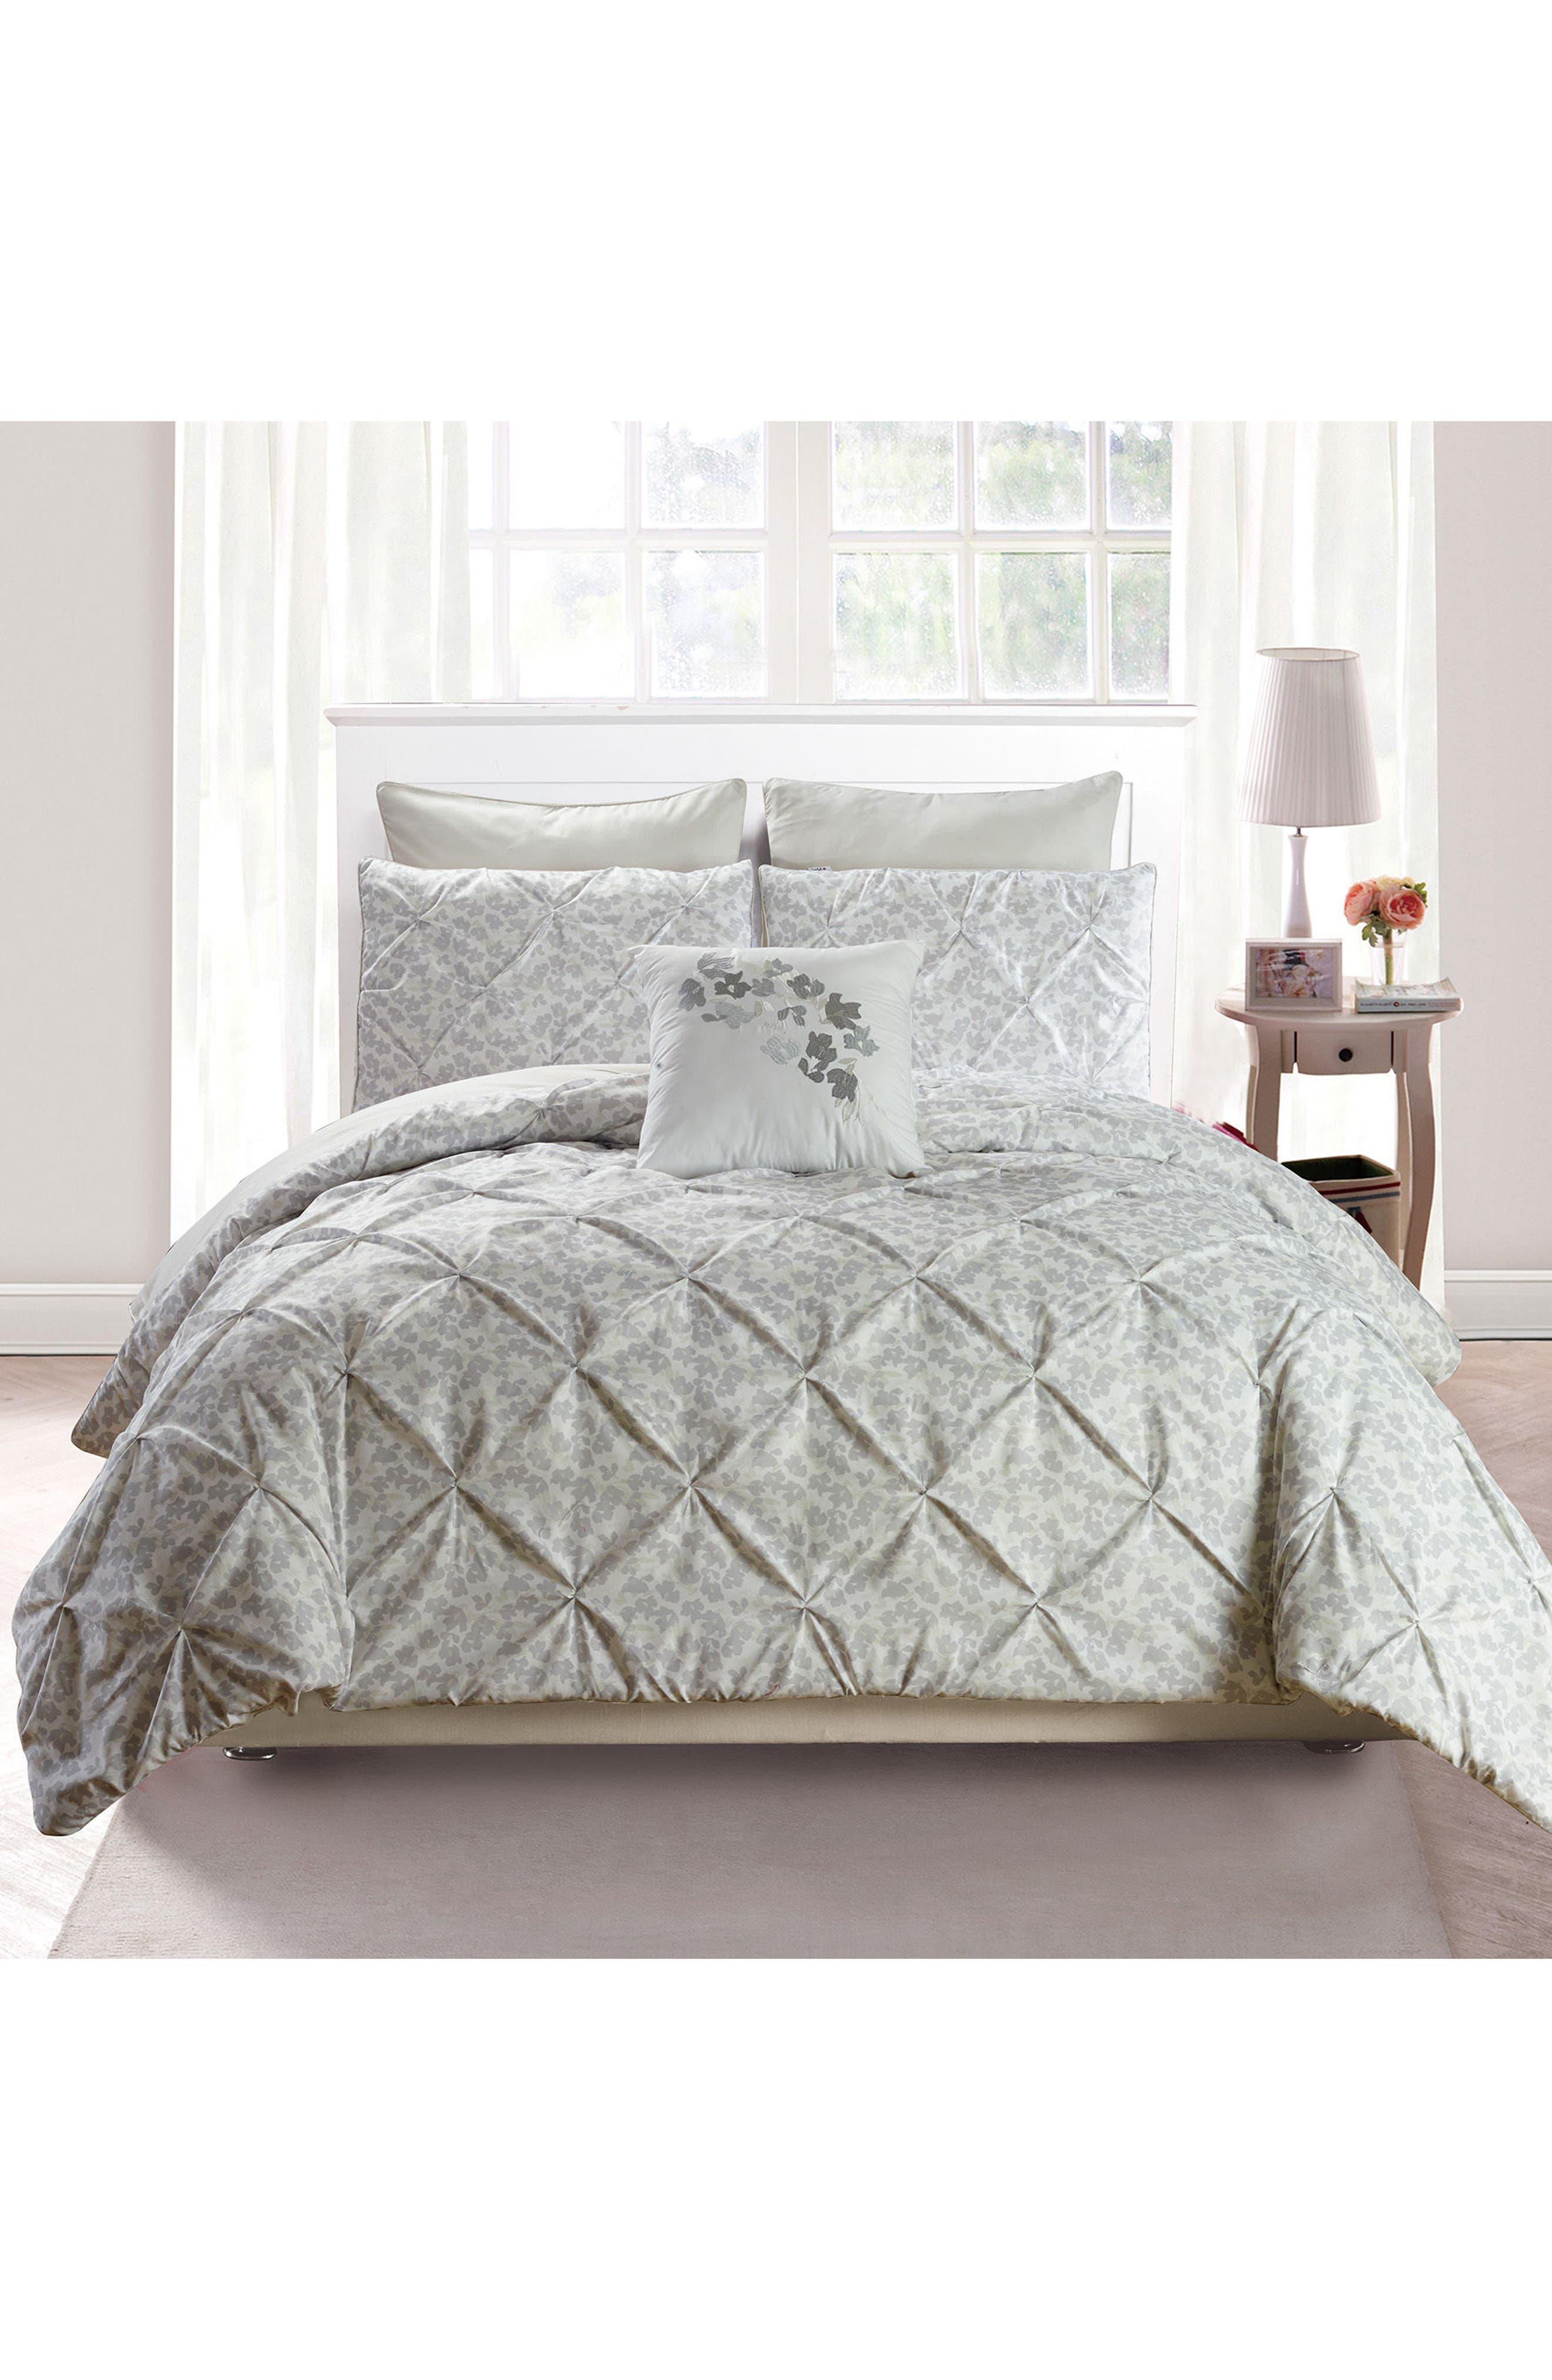 Alternate Image 1 Selected - Vera Adith 6-Piece King Comforter Set